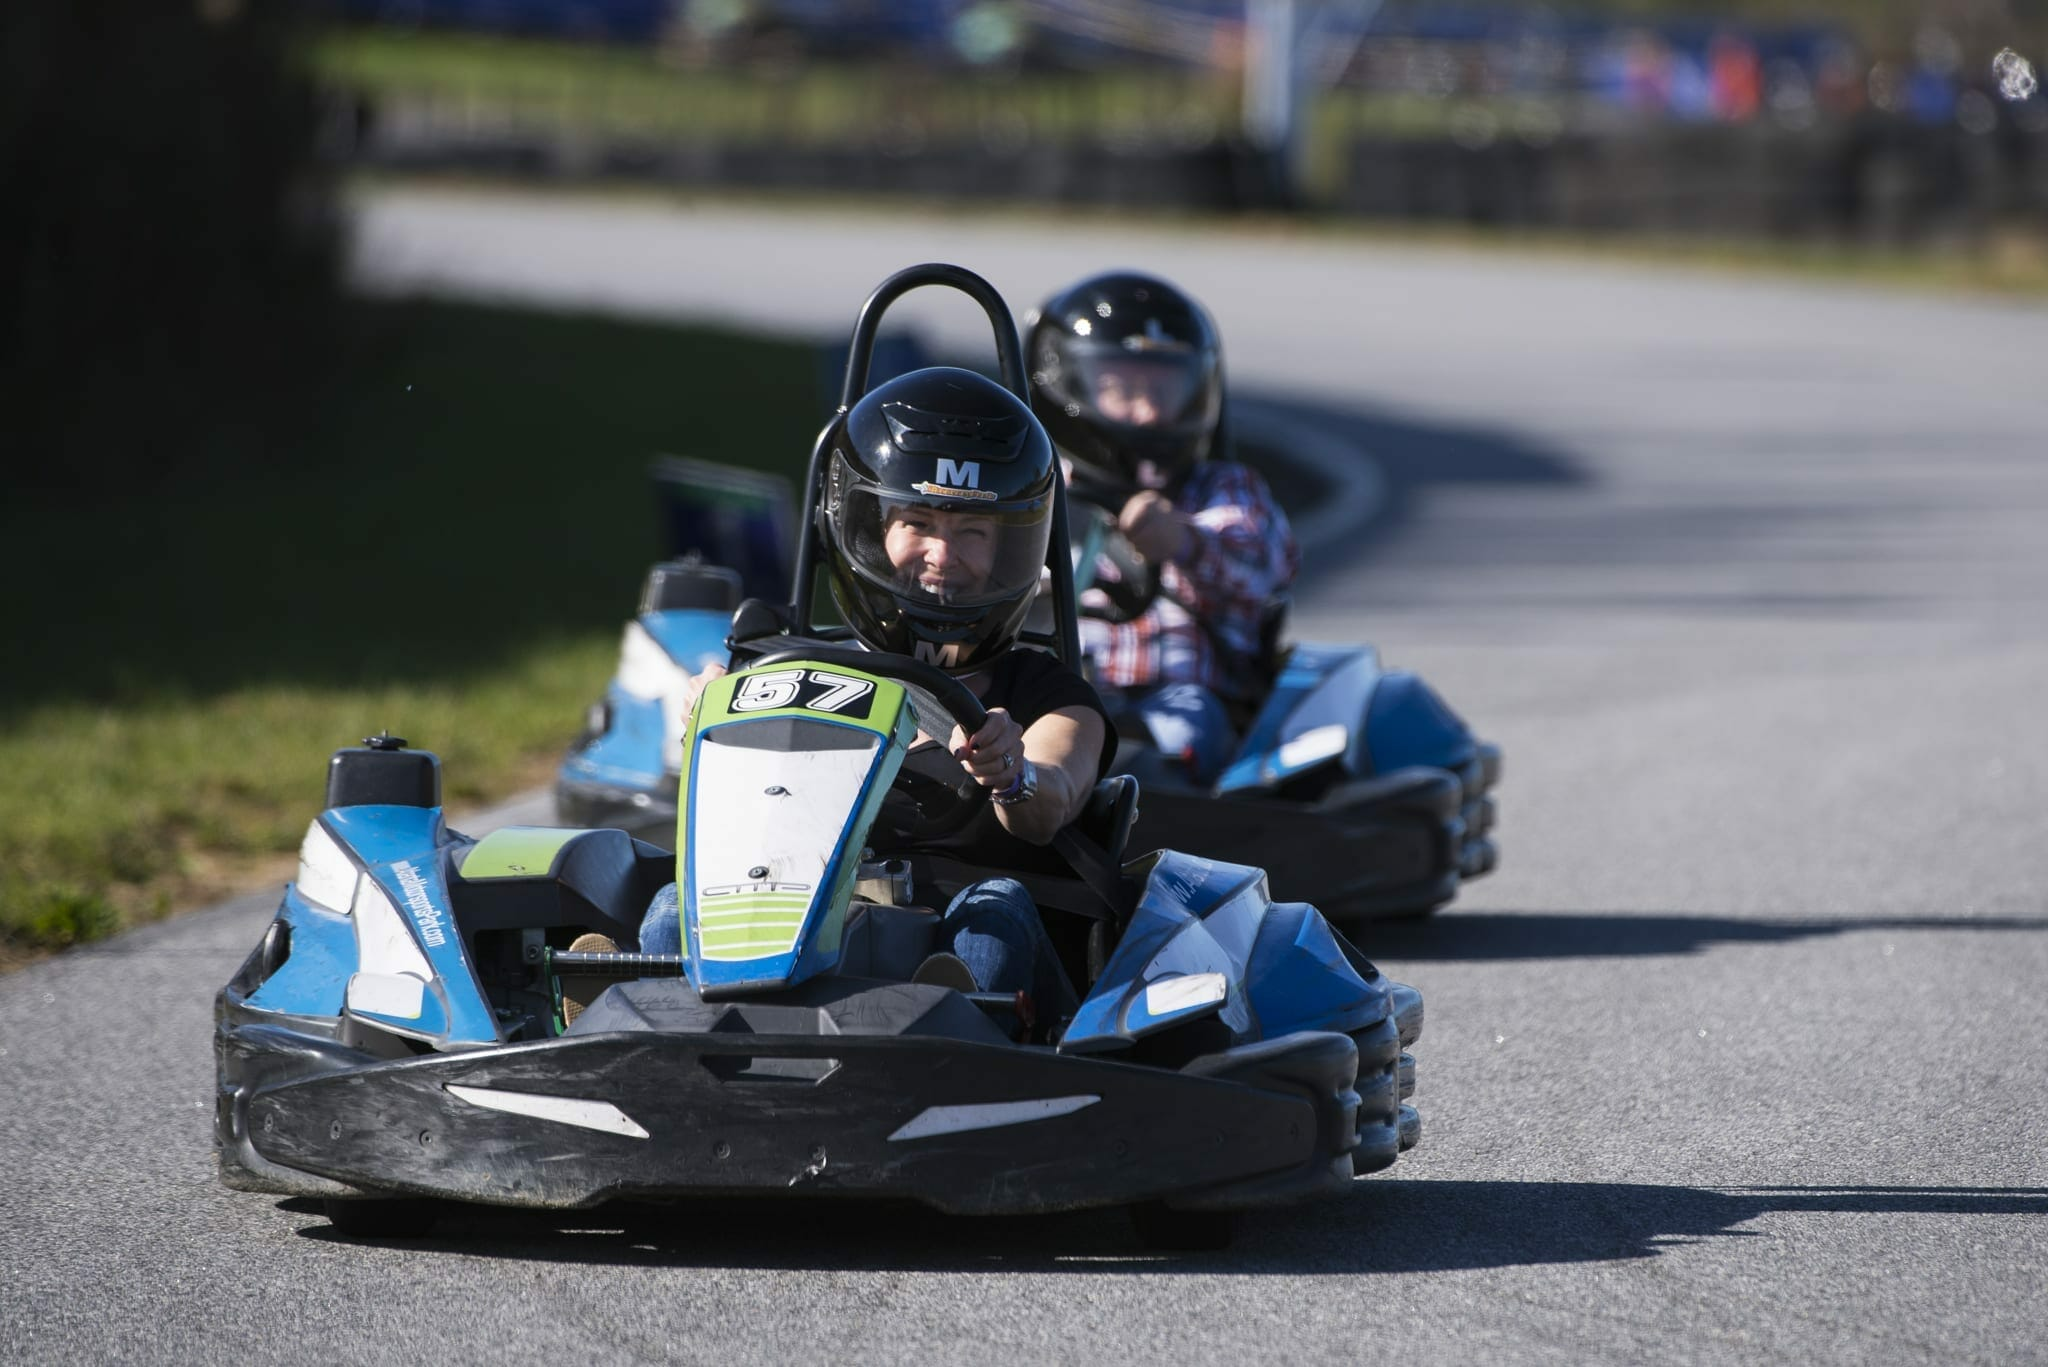 Karts - AMP Kart Championship Series Race 1 Recap